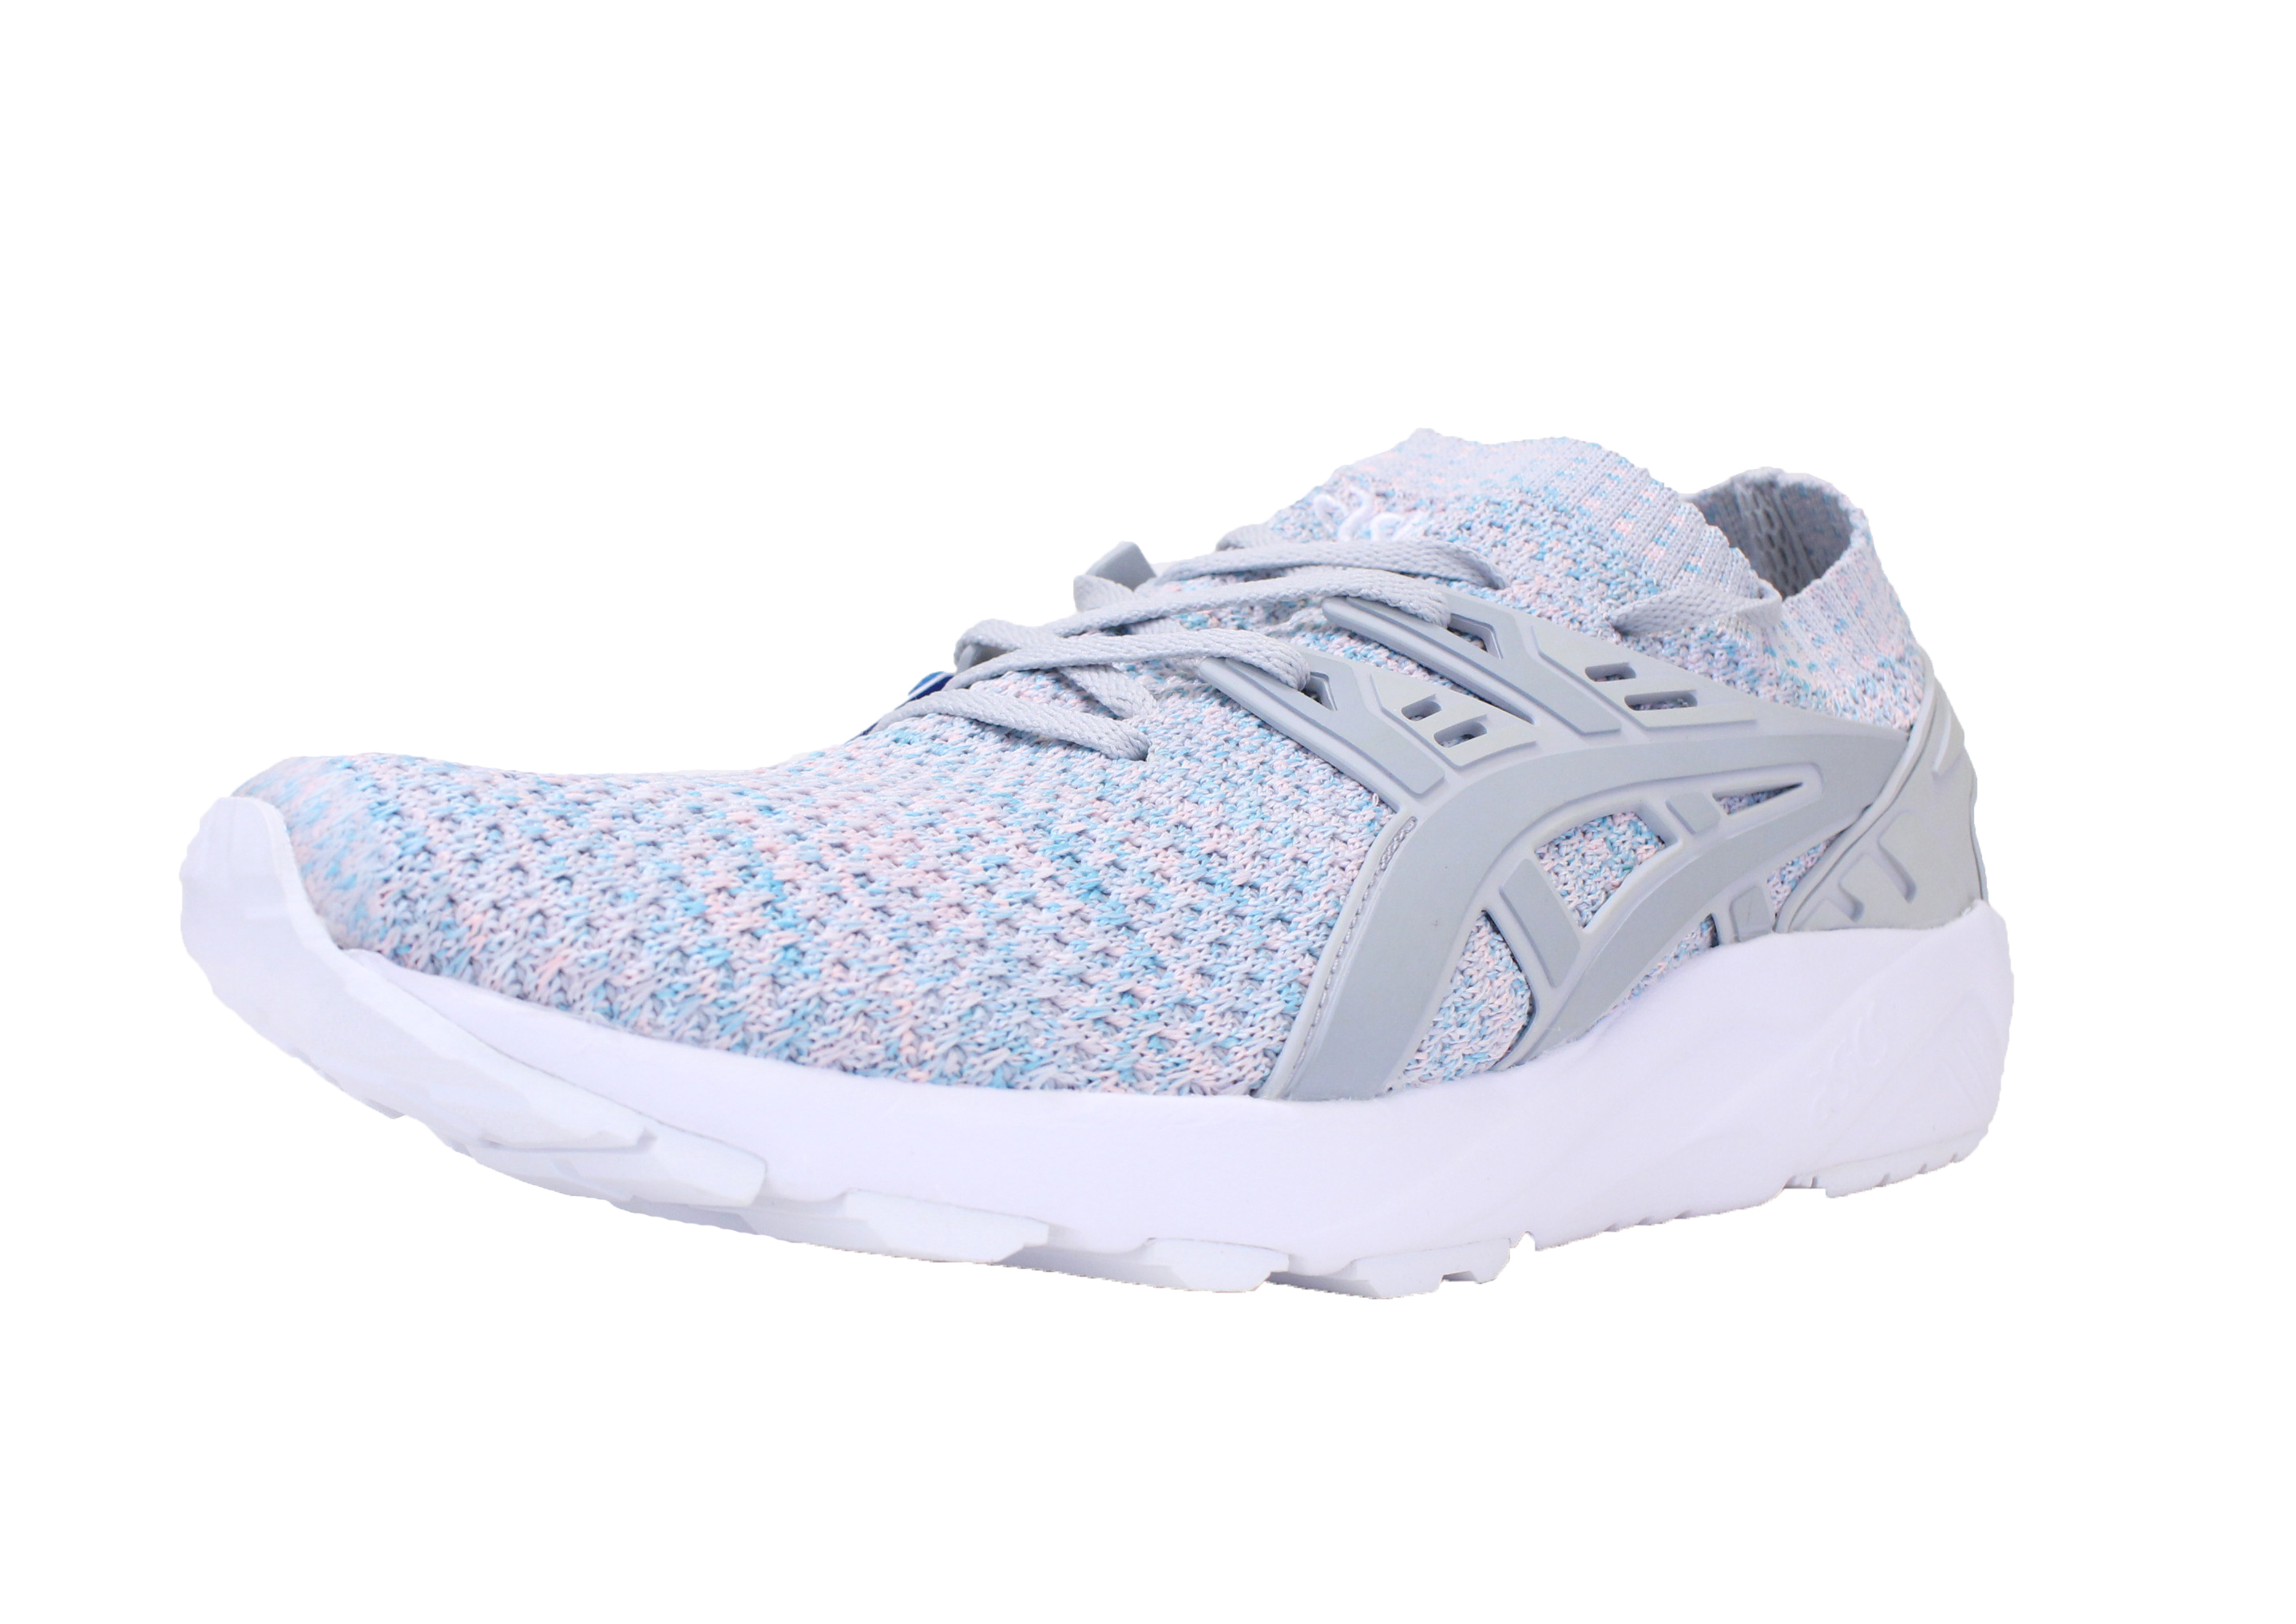 Asics Gel-Kayano Trainer Knit Glacier Grey Men/'s Running Shoes HN7M4-9696